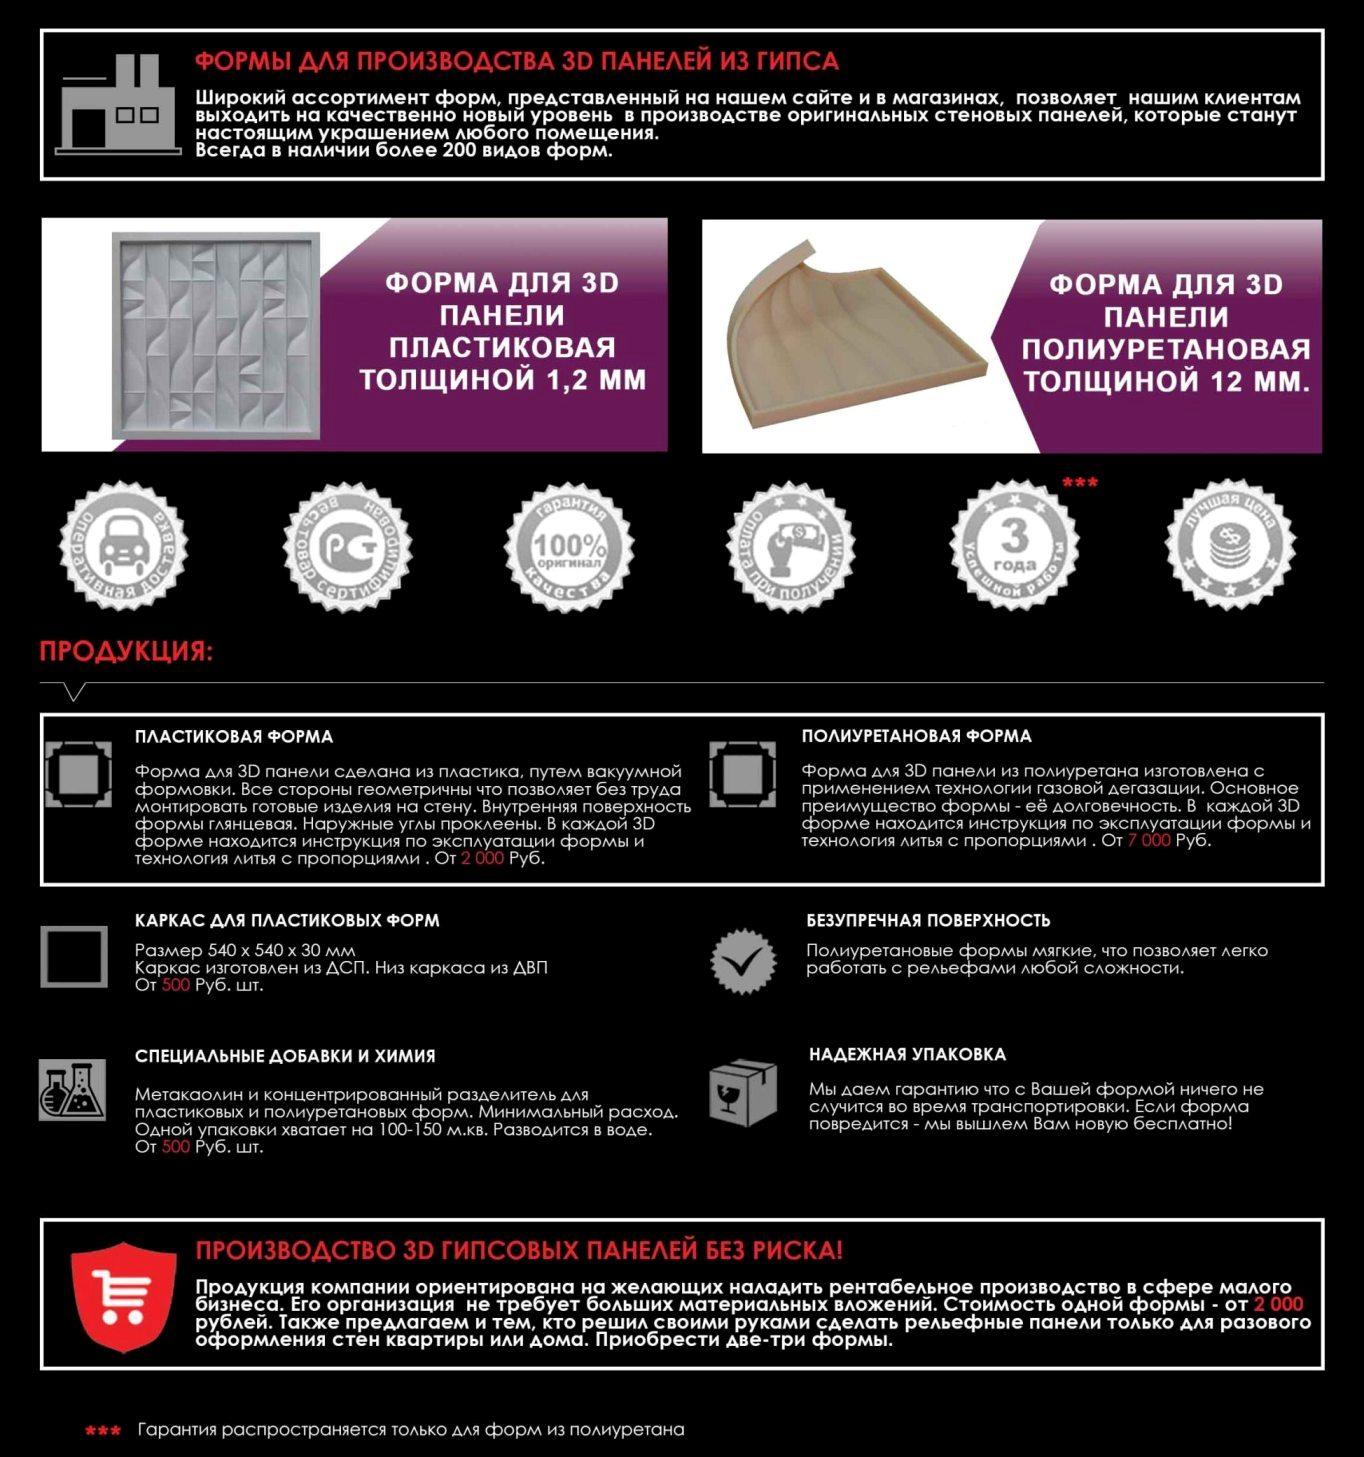 Широкий ассортимент форм из пластика и полиуретана для производства 3D панелей из гипса от фабрики TRIMIC